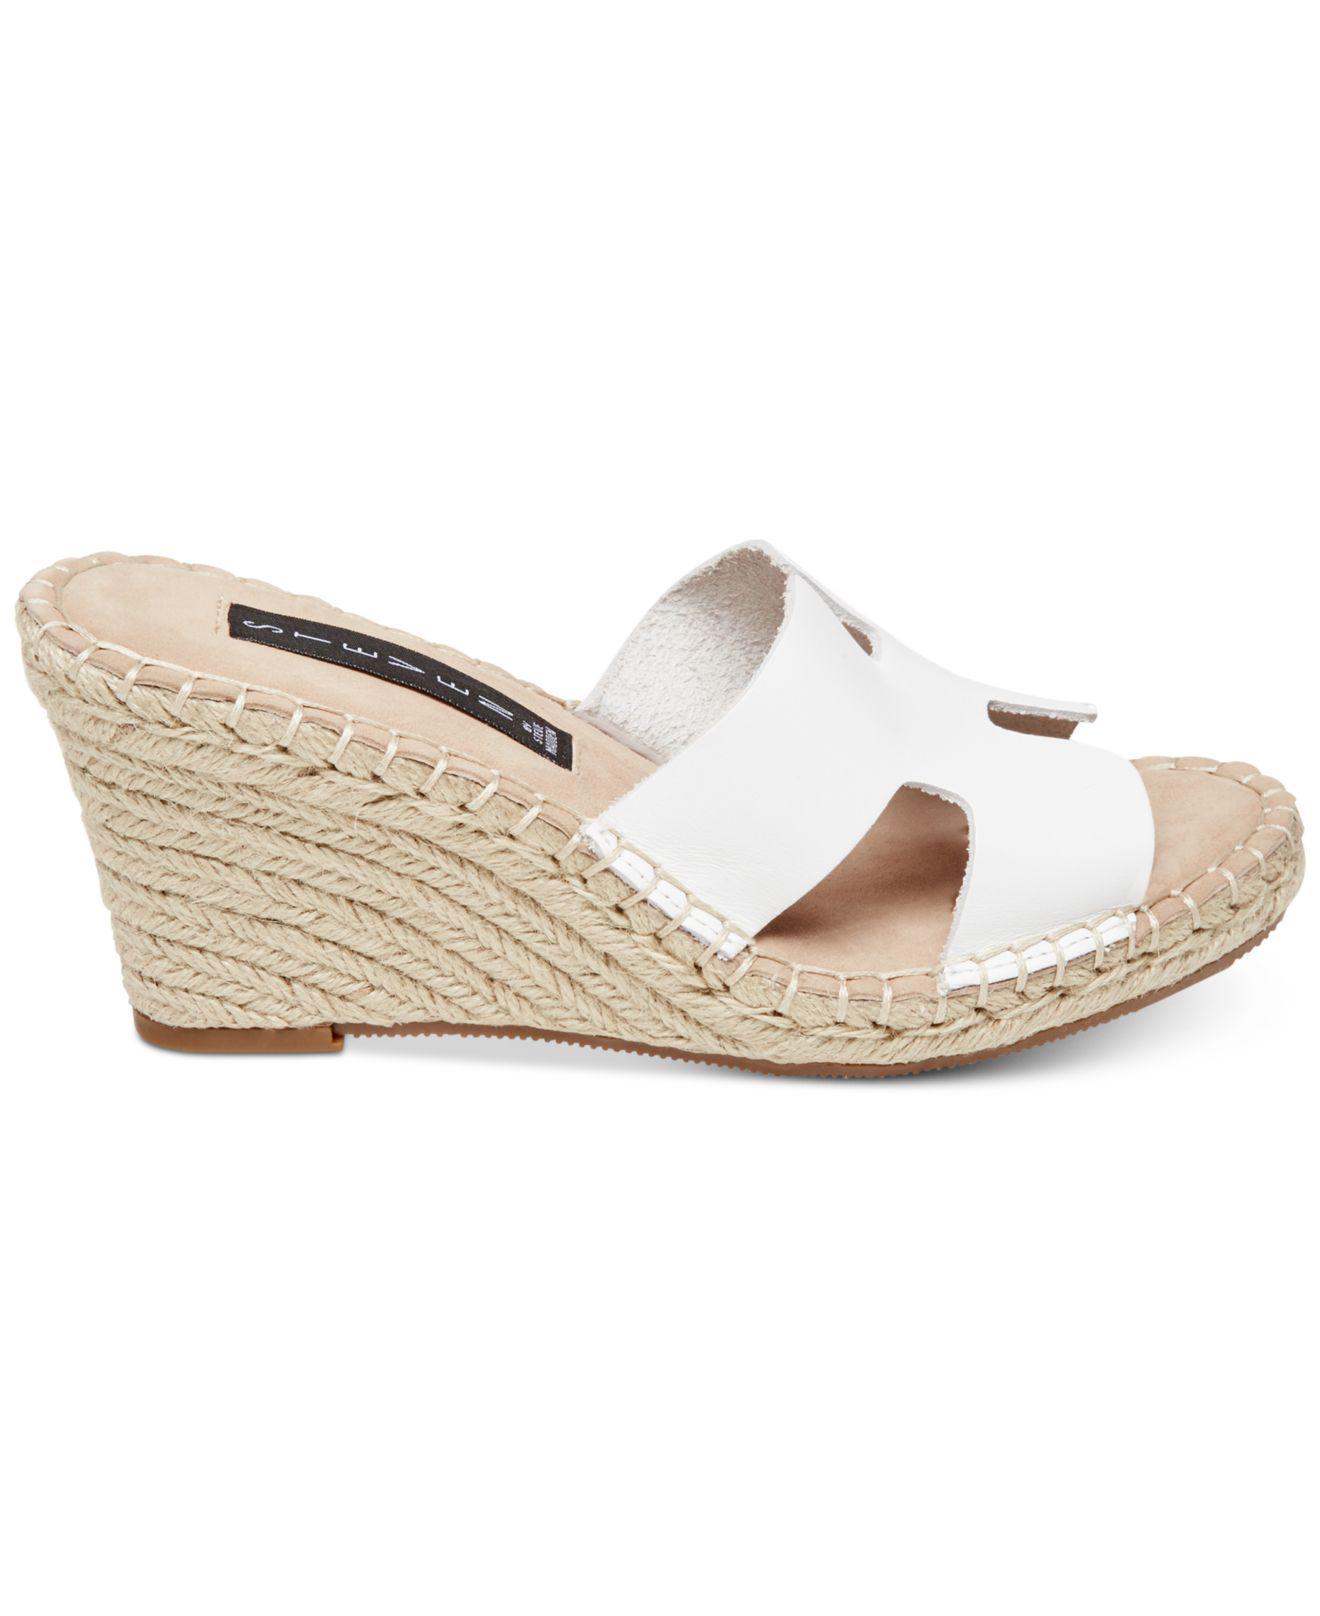 6da51ca2a39 Women's White Eryk Espadrille Wedge Sandals